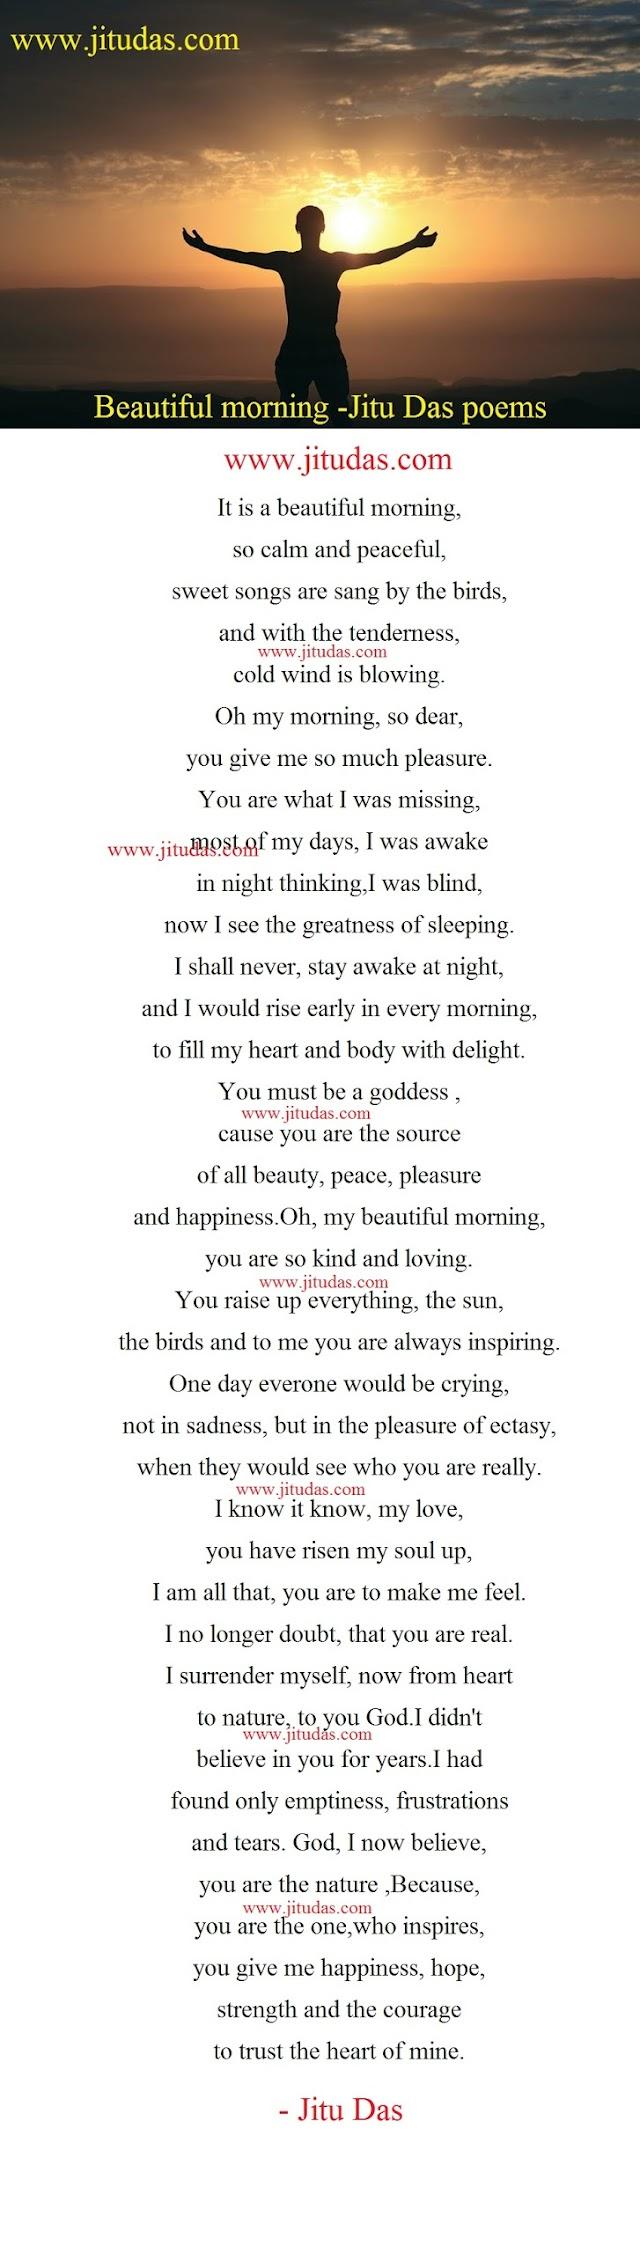 Beautiful morning poem by Jitu Das english poems